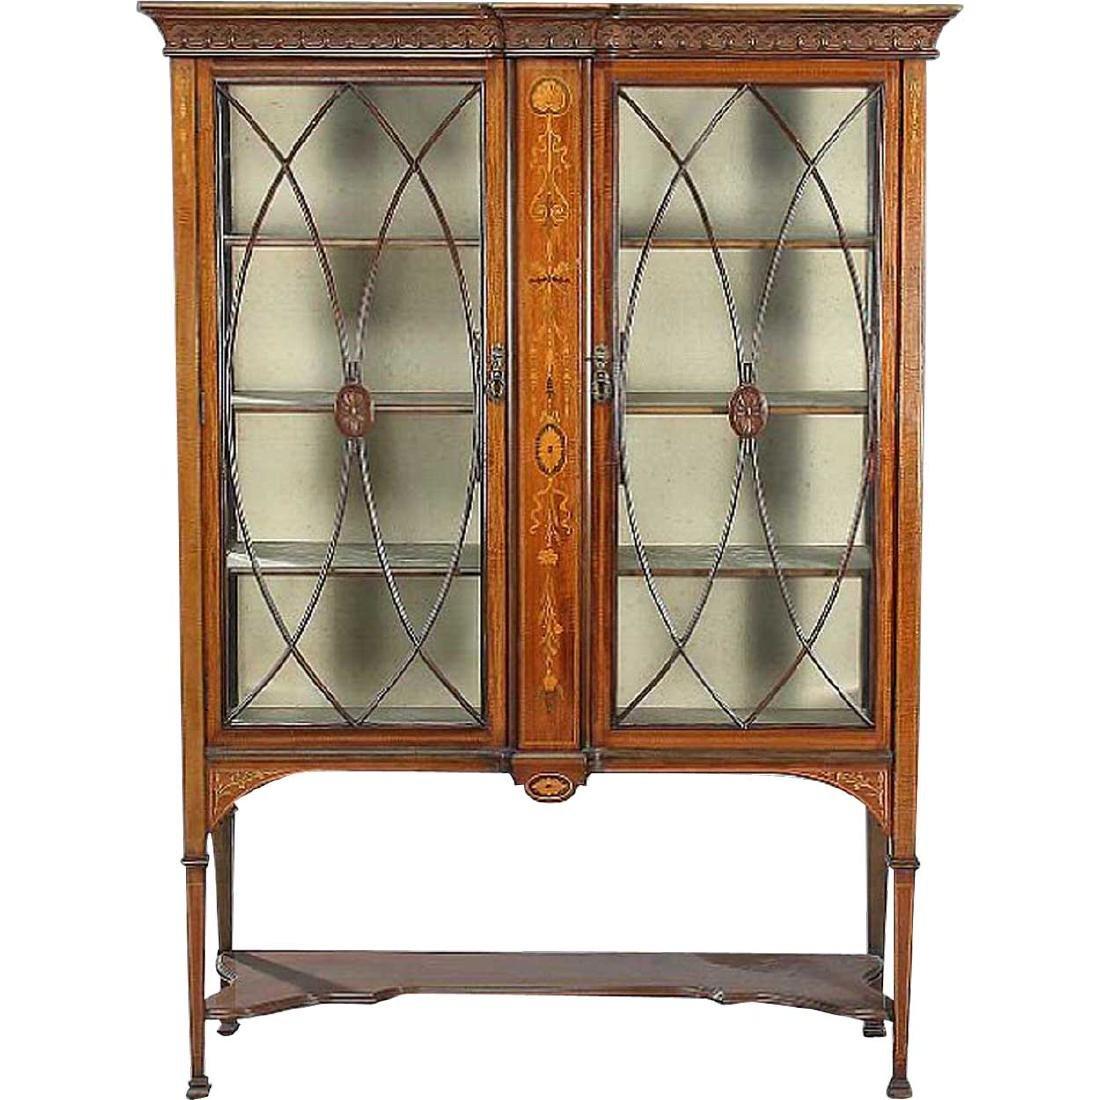 English Edwardian Adam Style Glass Display Cabinet